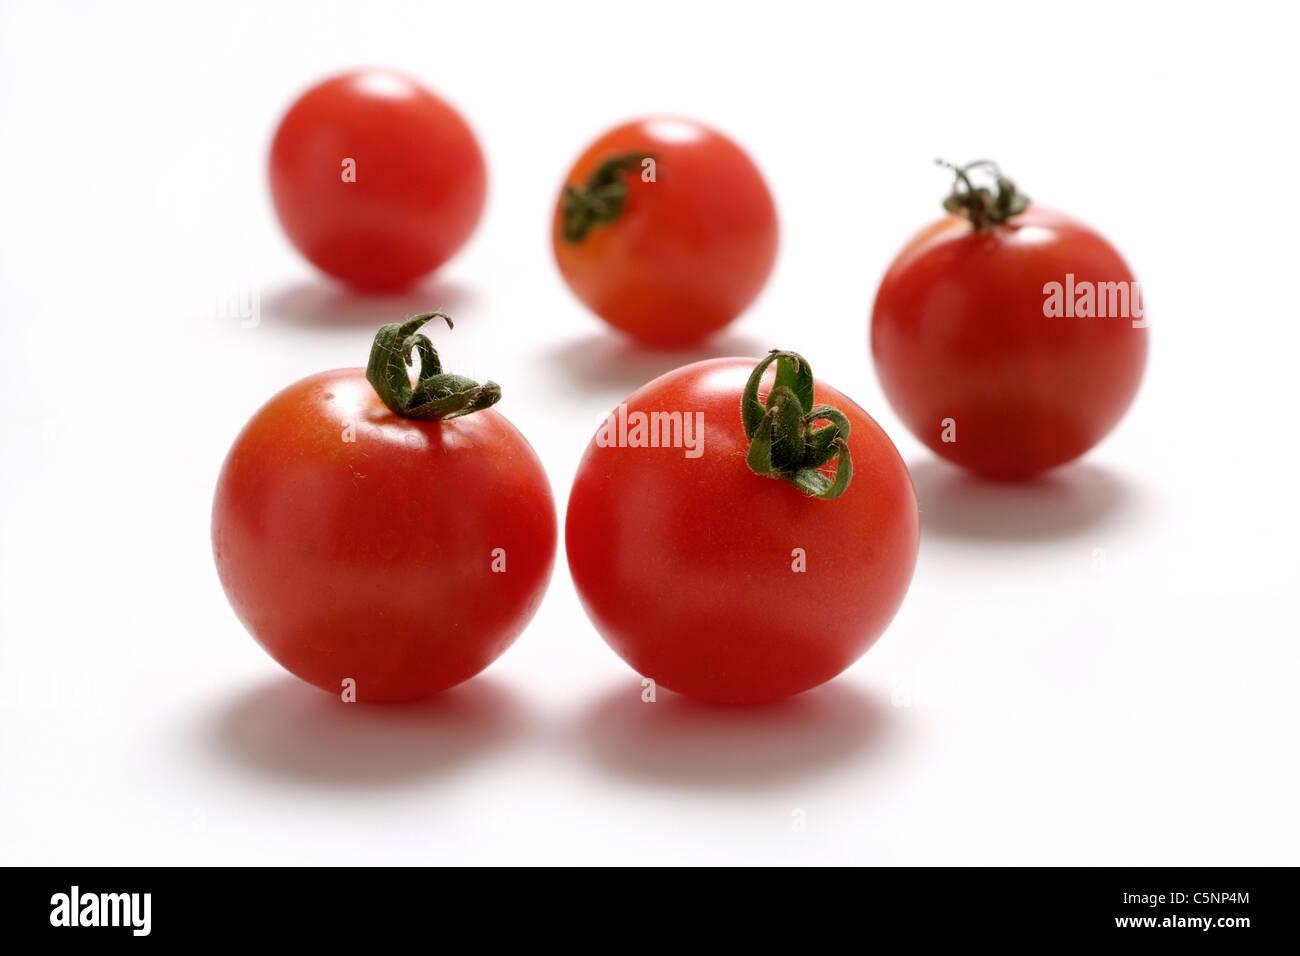 Tomato varieties: Supersweet - Stock Image